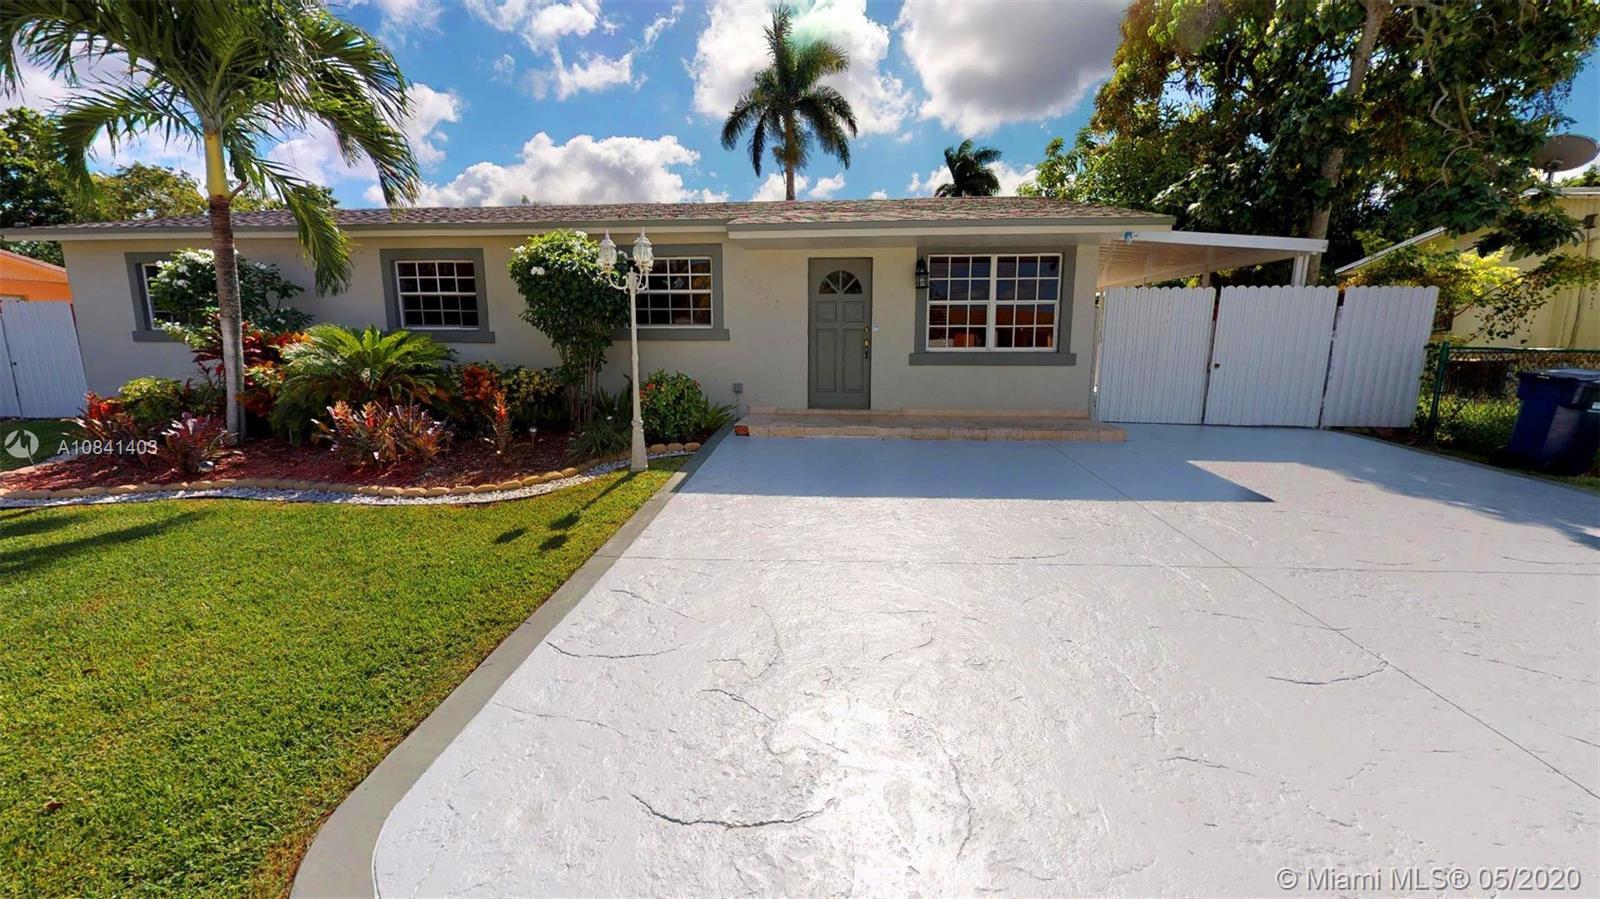 15340 SW 306th St #A, Homestead, FL 33033 - Homestead, FL real estate listing